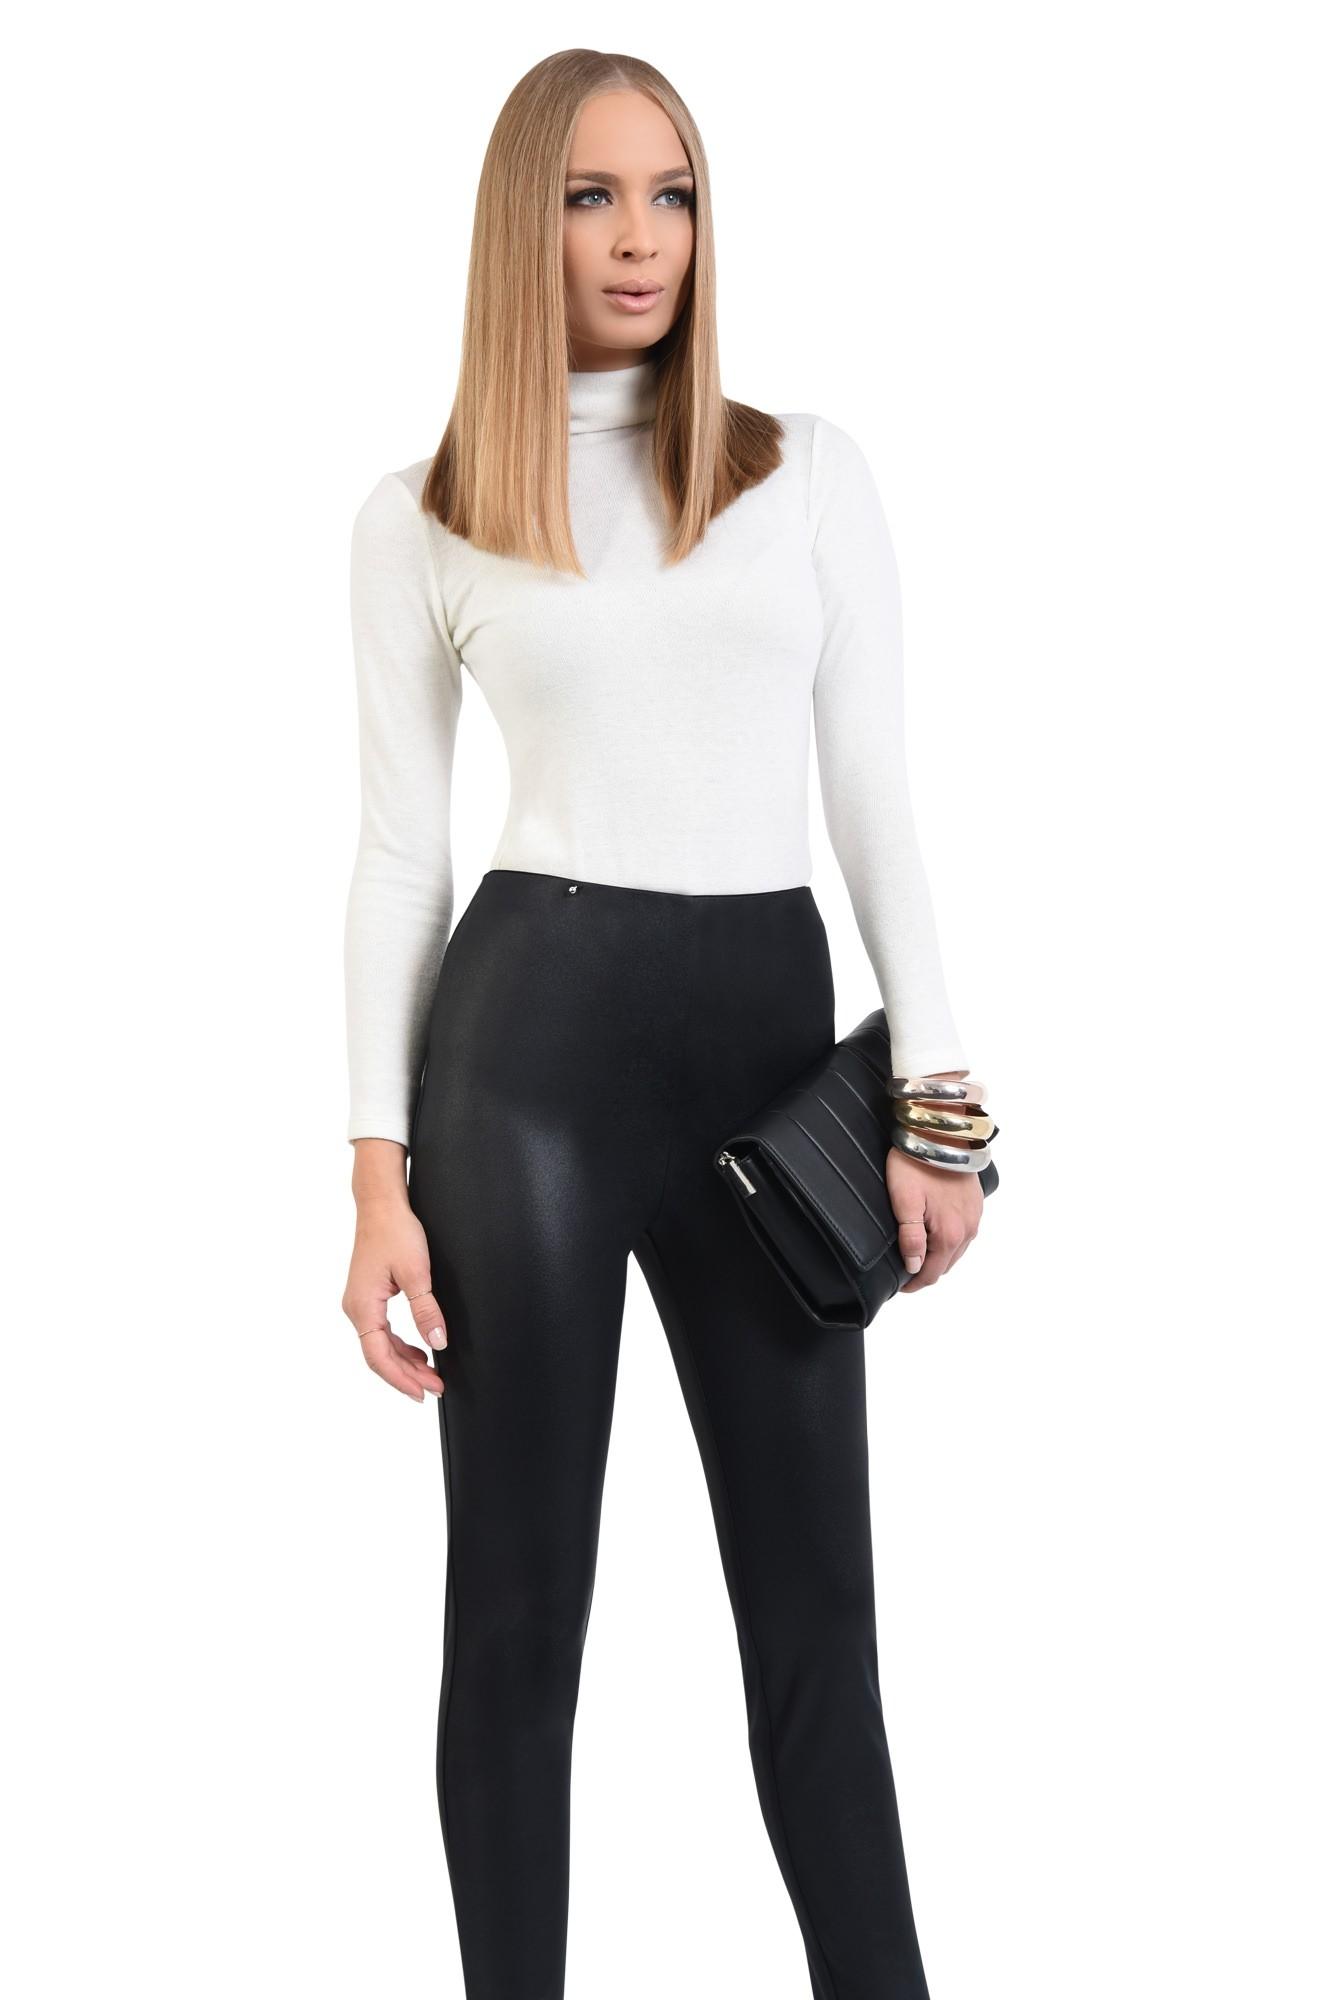 0 - pantaloni negri, fermoare la glezna, talie inalta, peliculizati